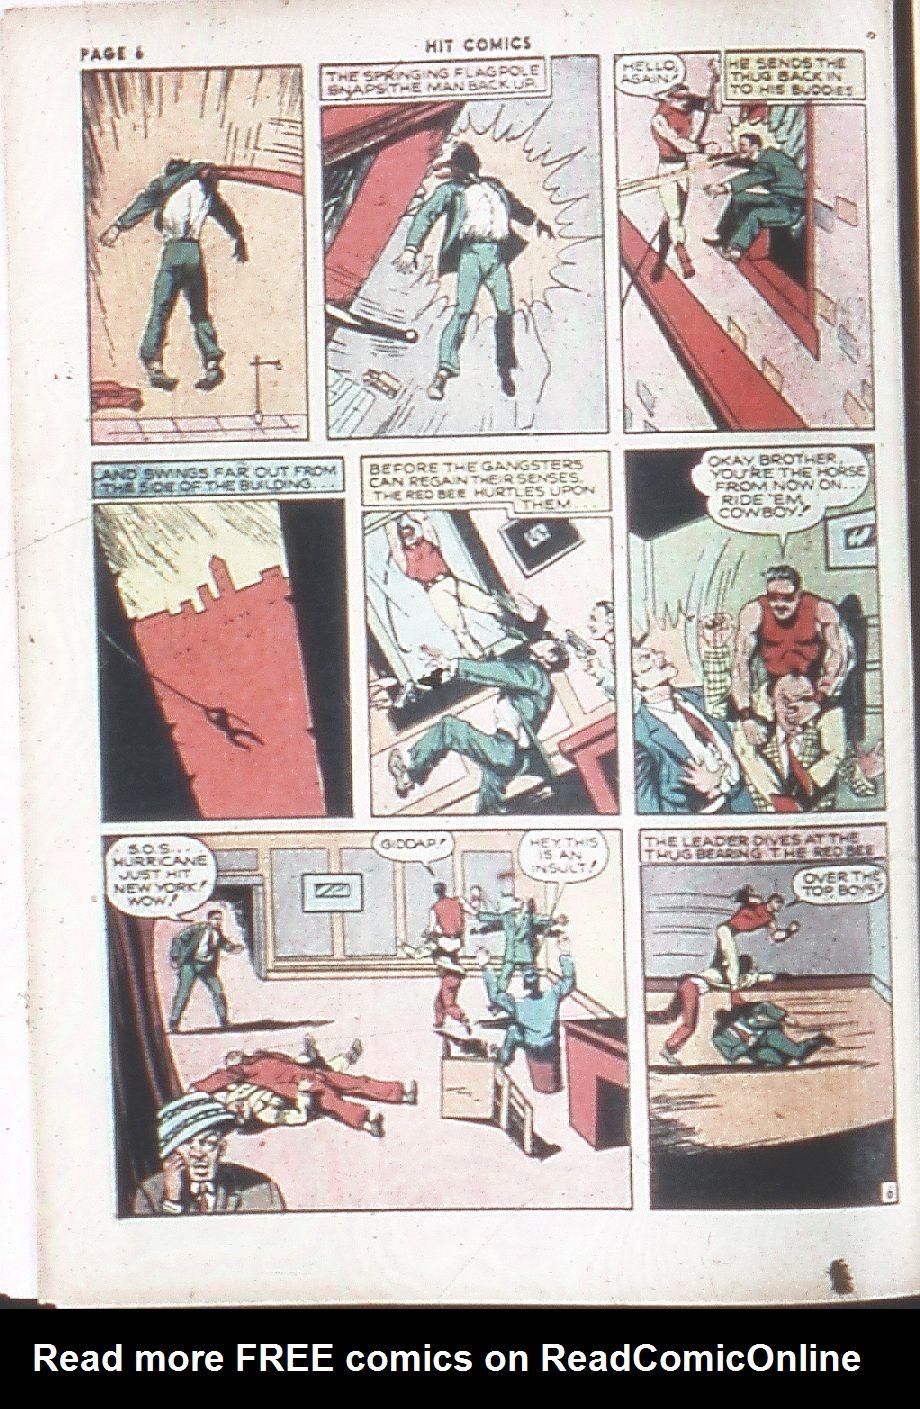 Read online Hit Comics comic -  Issue #7 - 8